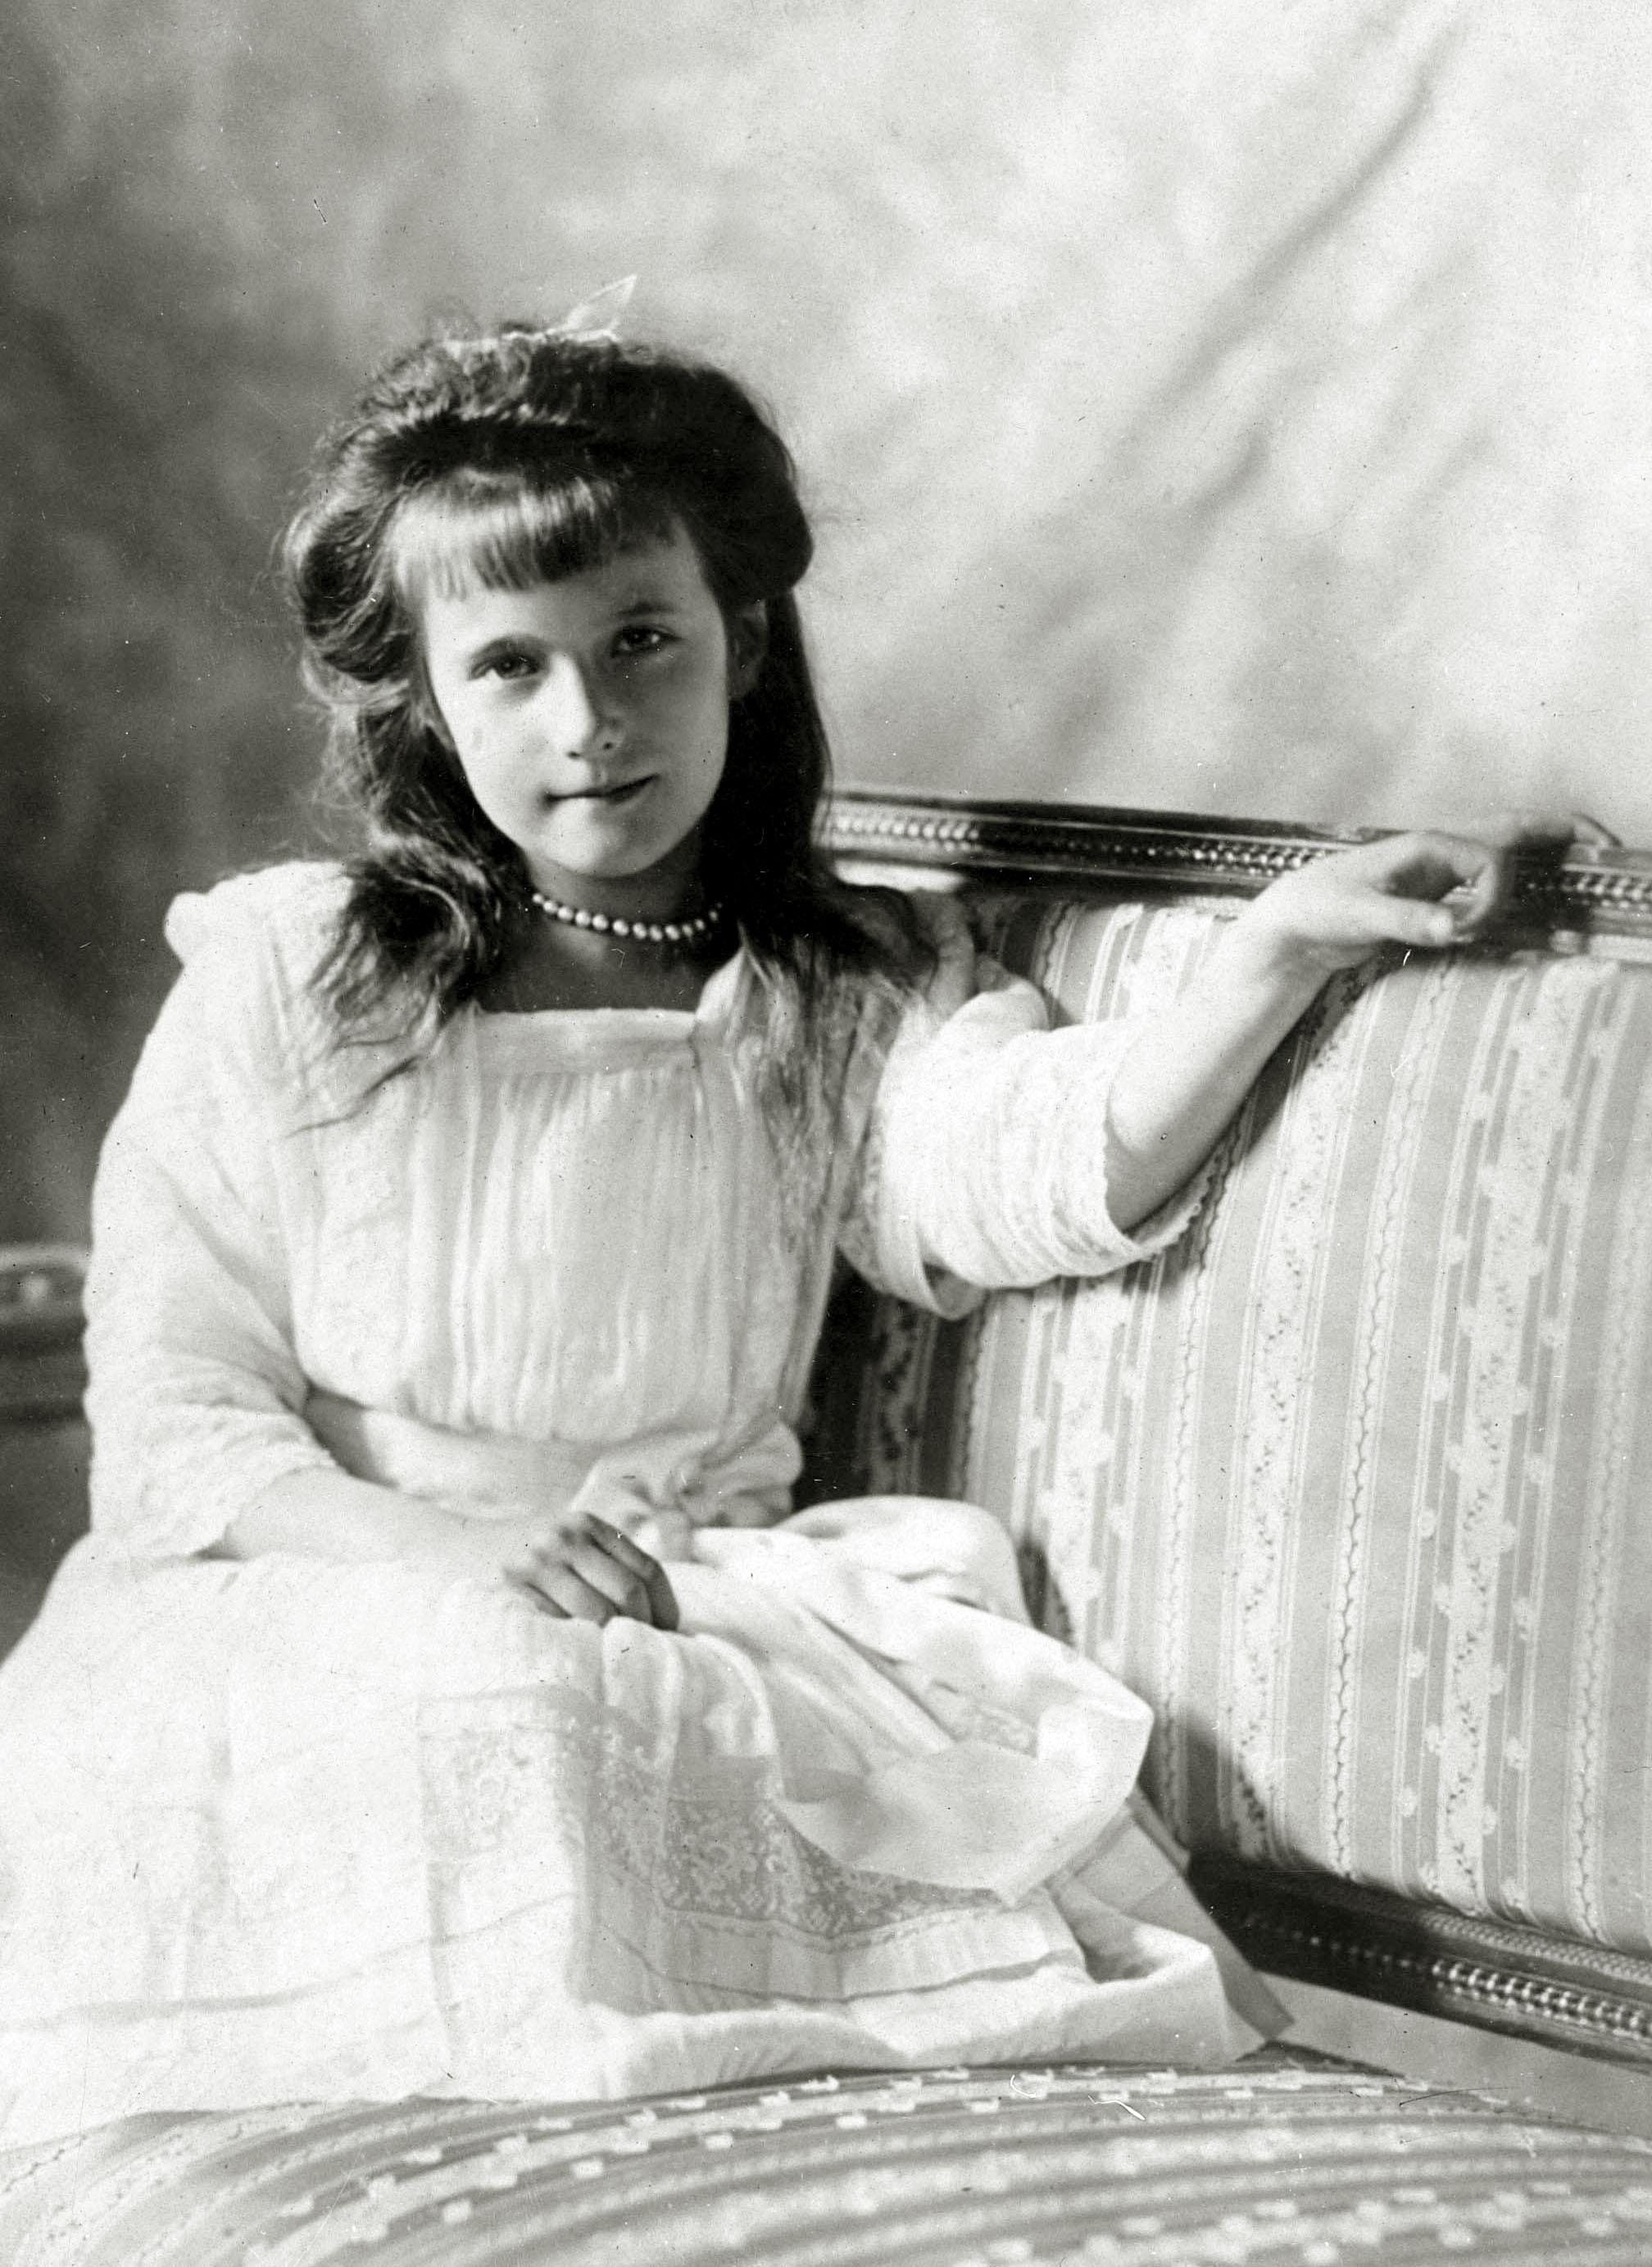 La Grande-duchesse de Russie, Anastasia